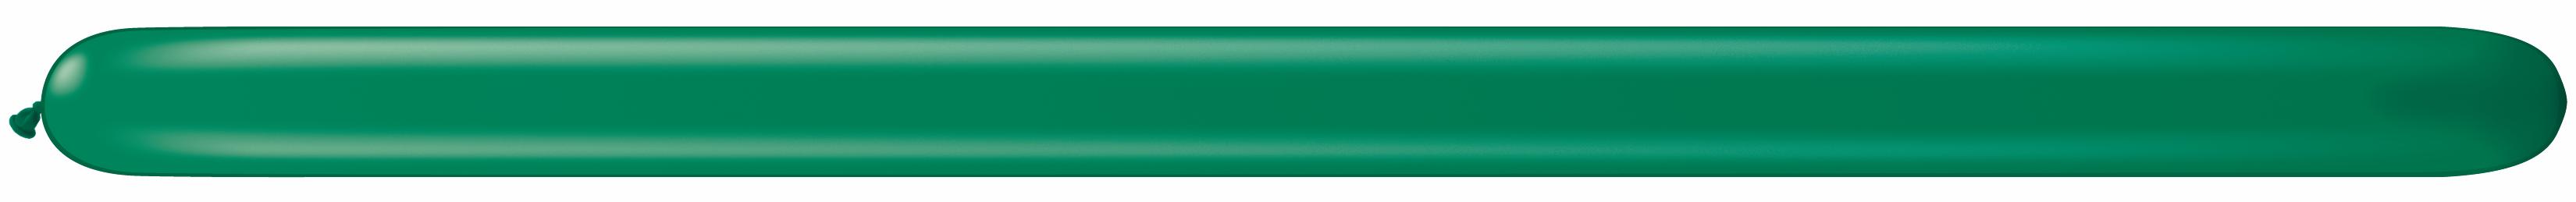 160Q Jewel Emerald Green Entertainer Balloons (100 Count)